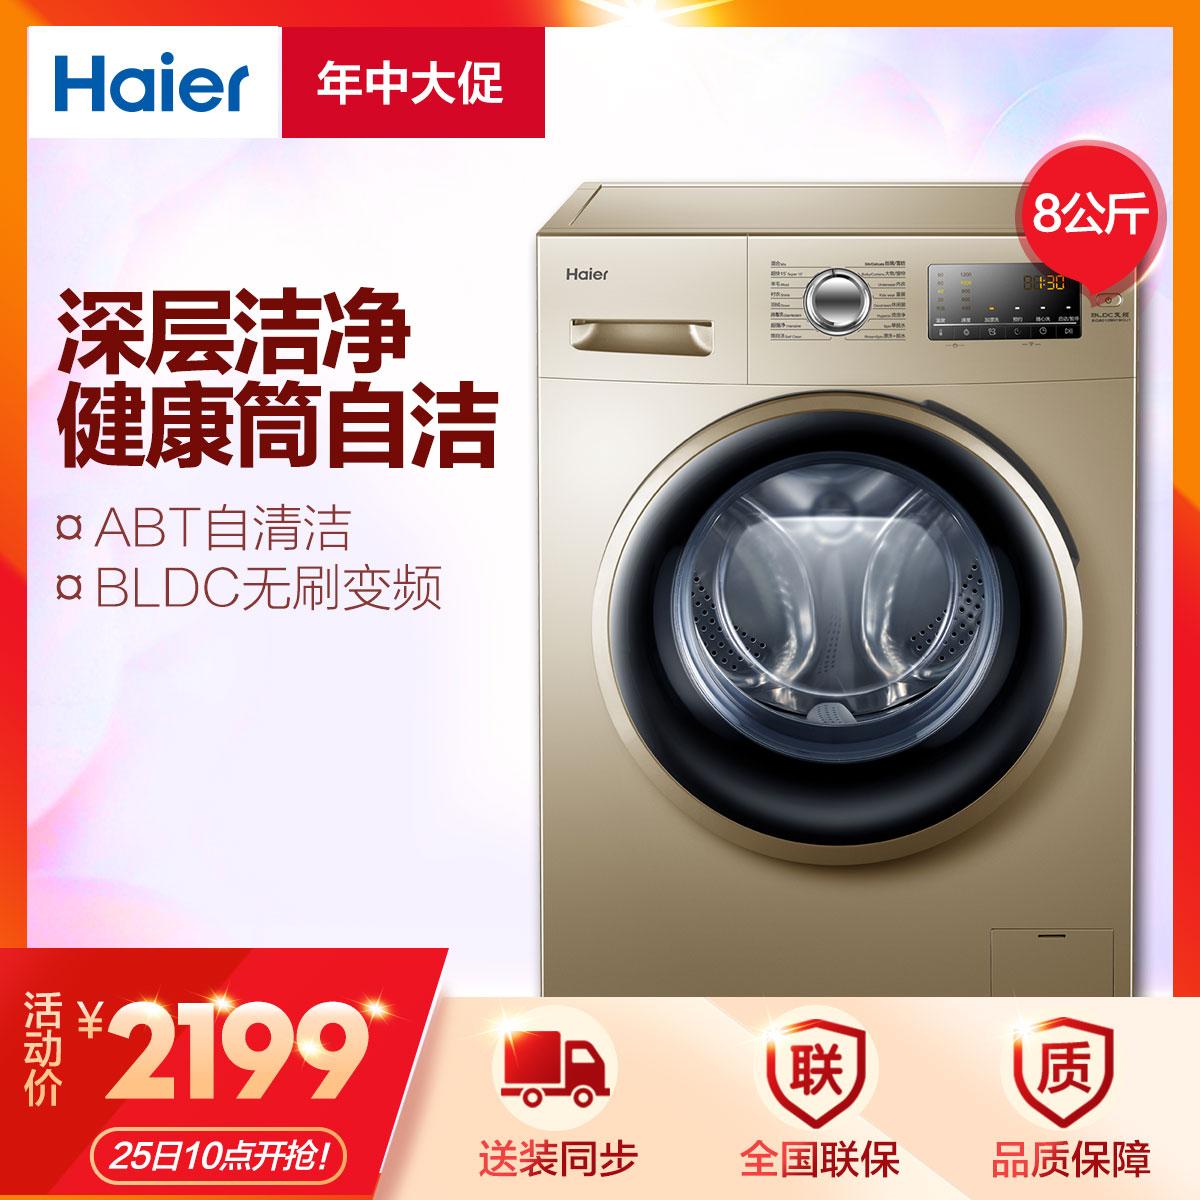 Haier/海尔 滚筒洗衣机 EG8012B919GU1 8公斤iMate8智能变频滚筒洗衣机